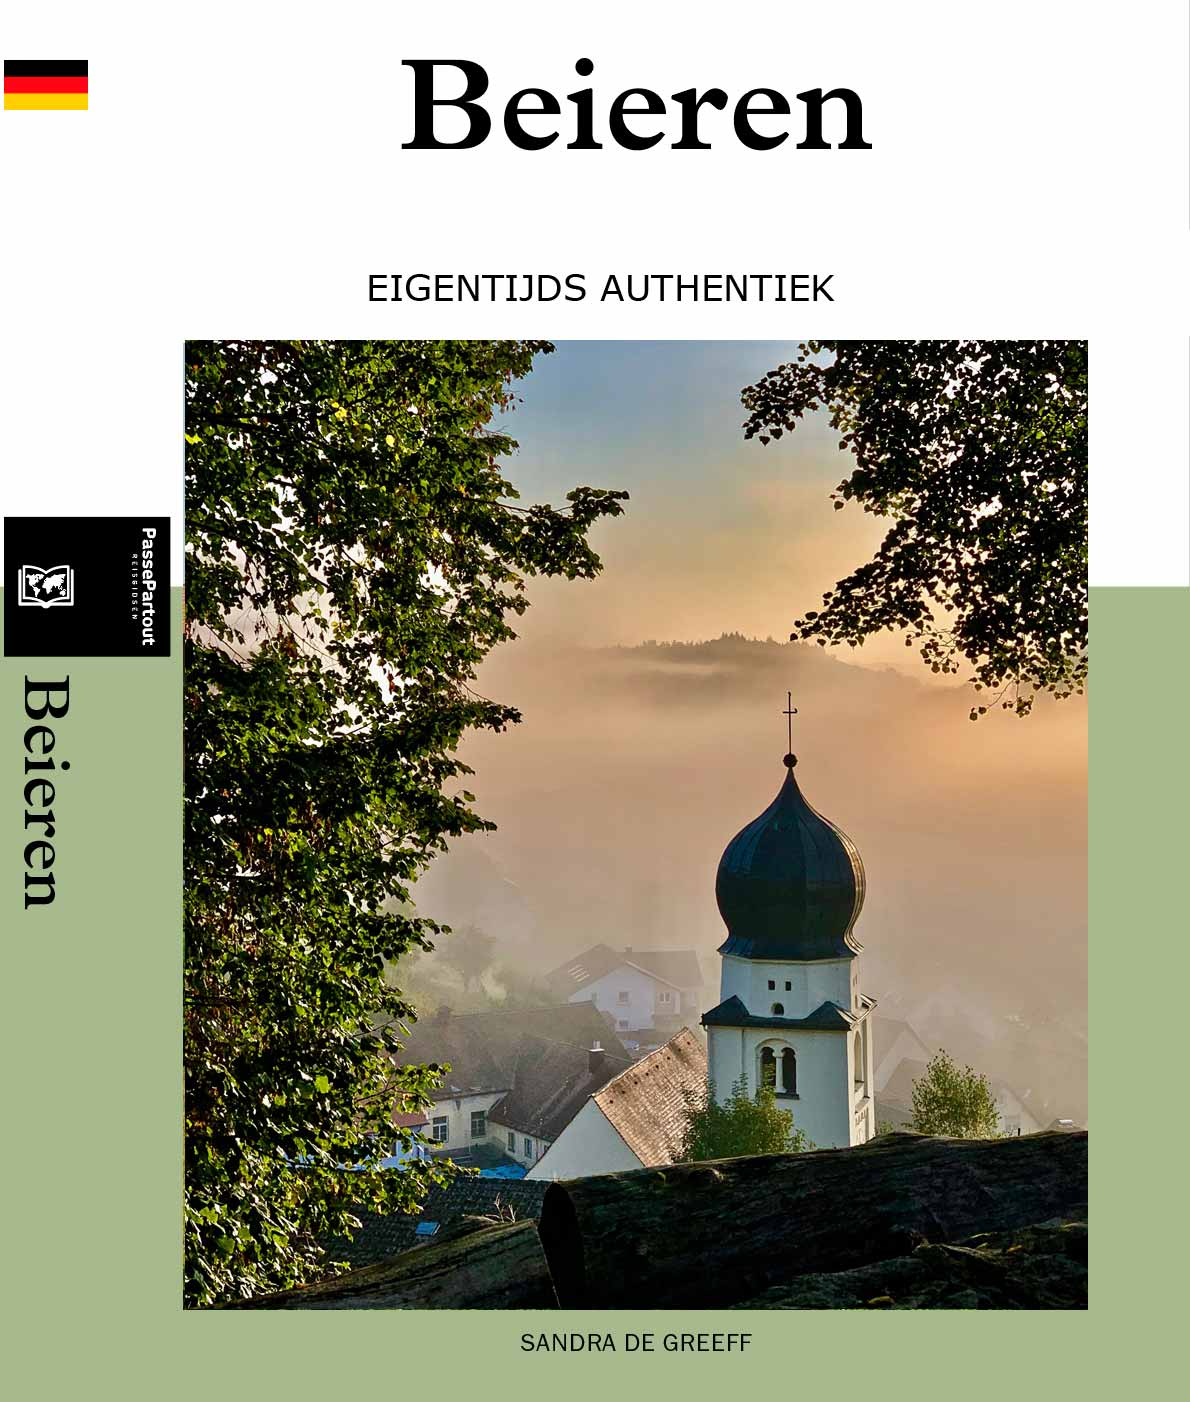 Reisgids Beieren - EIGENTIJDS AUTHENTIEK